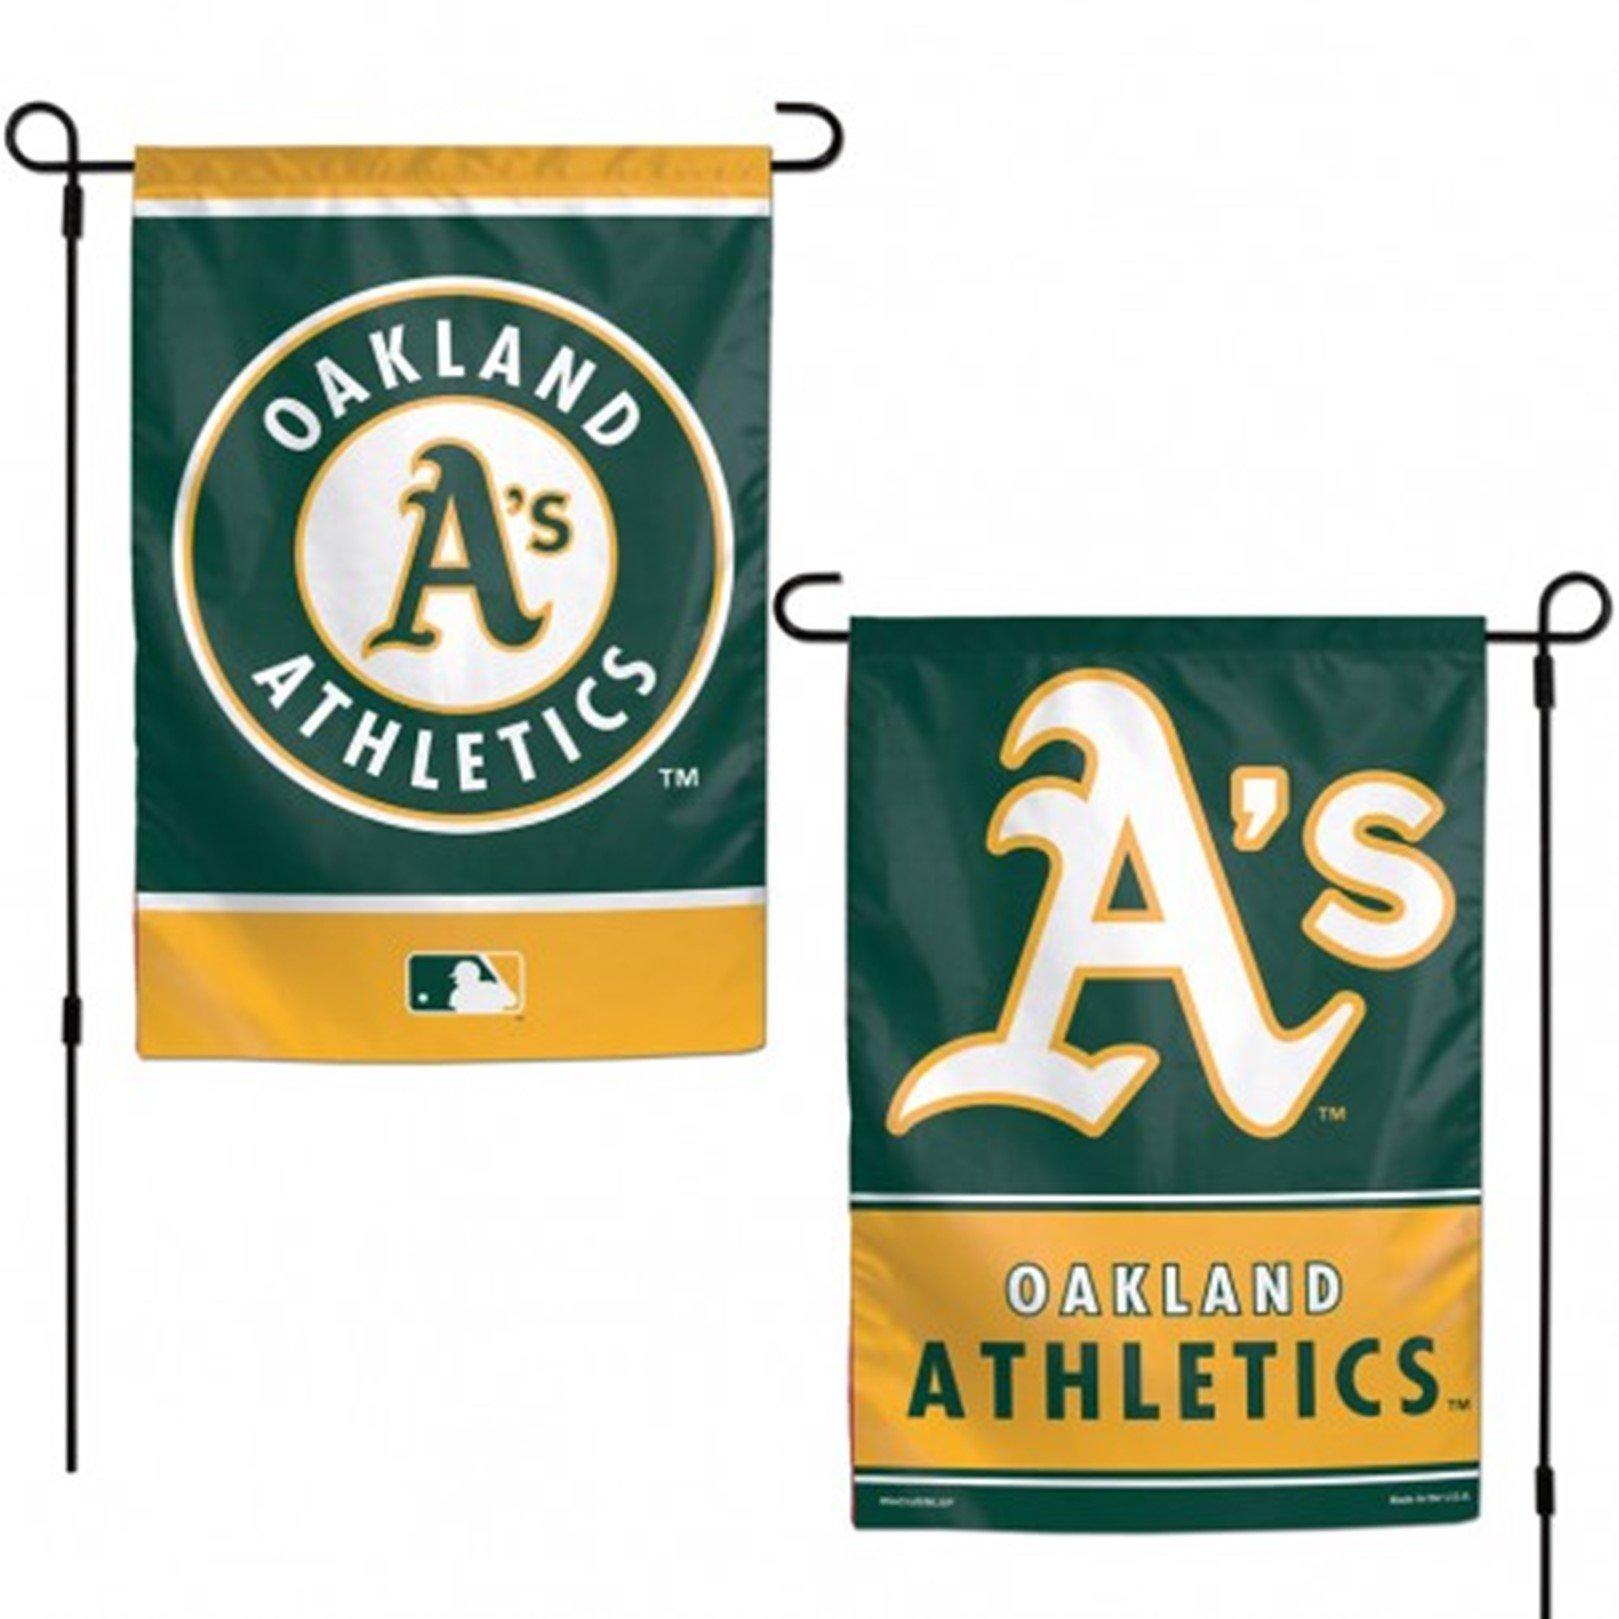 Stockdale Oakland Athletics A's WC GARDEN FLAG Premium 2-sided Banner Outdoor Baseball